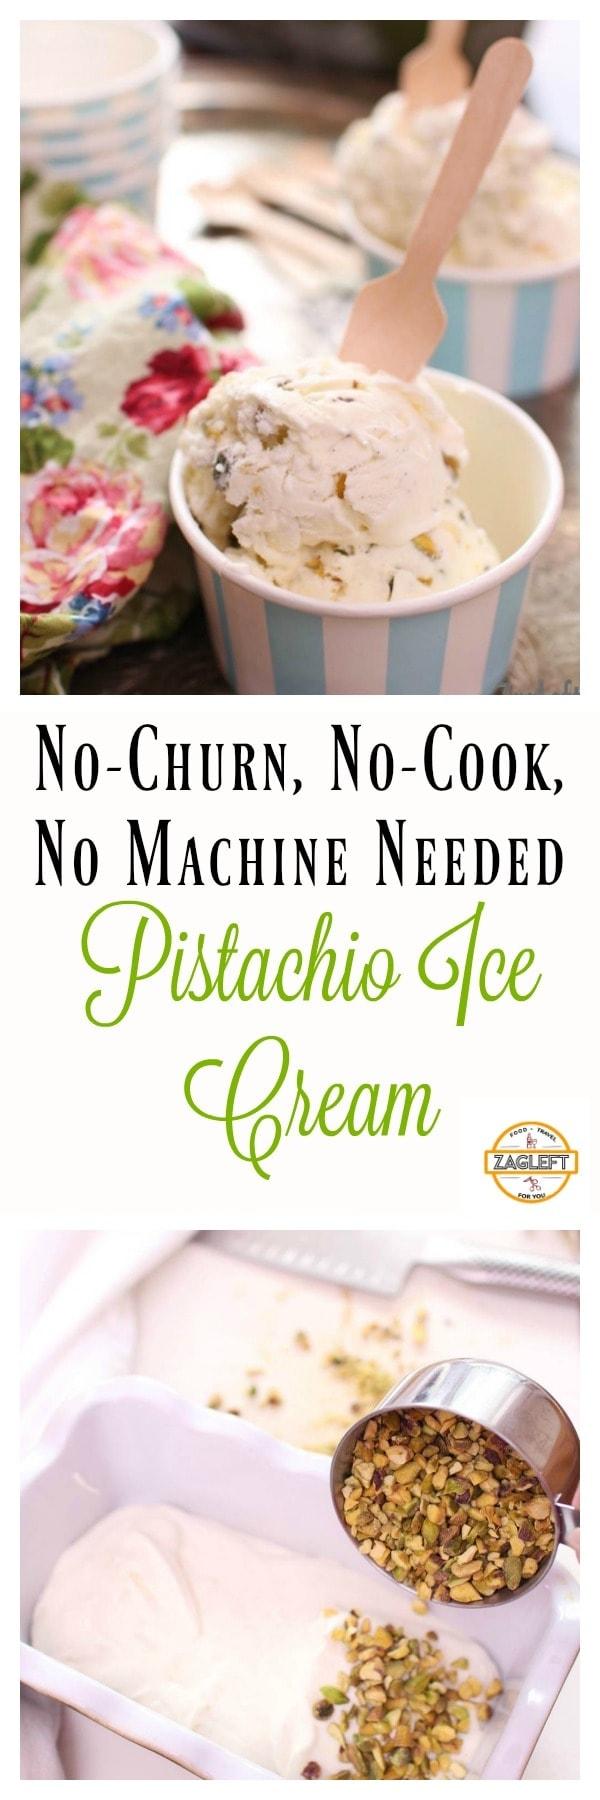 Pistachio Ice Cream | ZagLeft